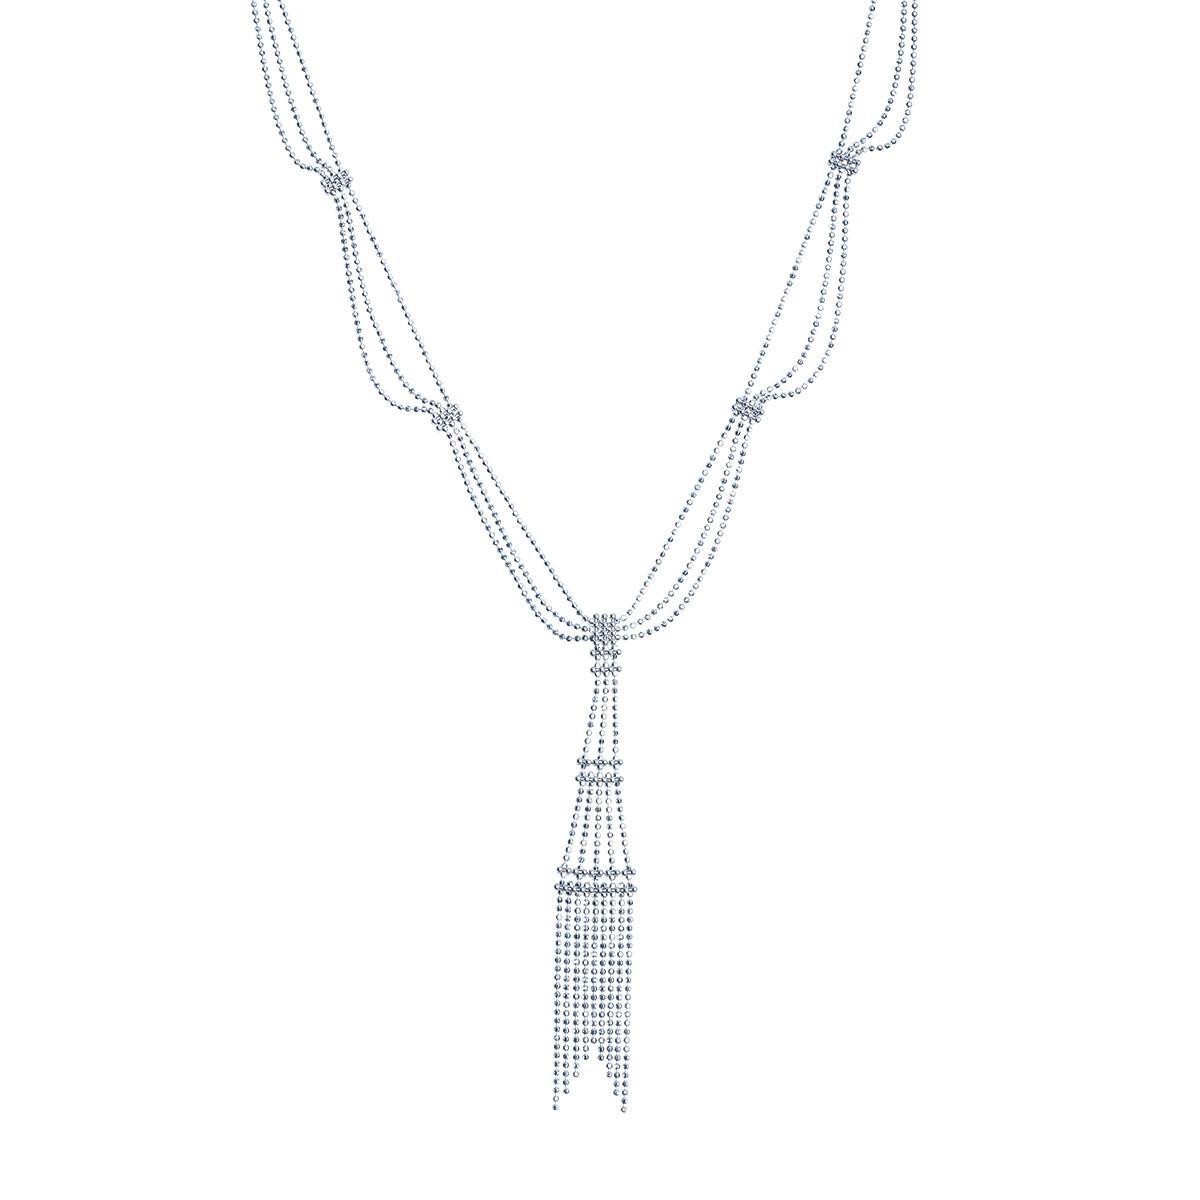 Vintage Tiffany & Co. Fringe Tower Necklace